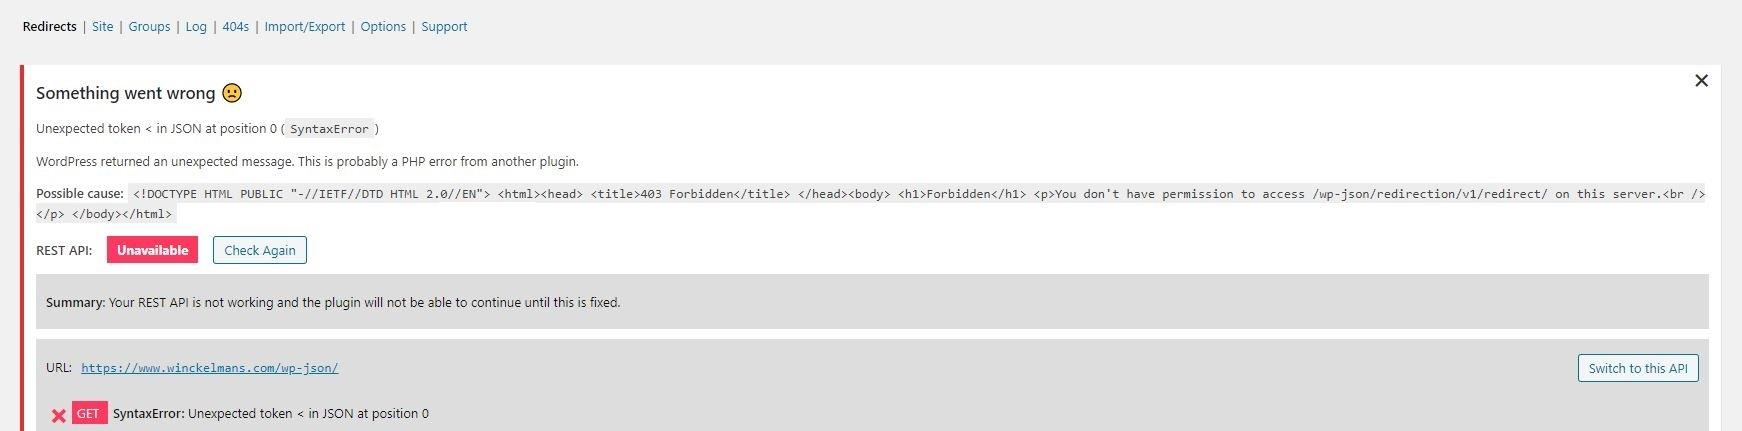 redirection-errors-0.JPG